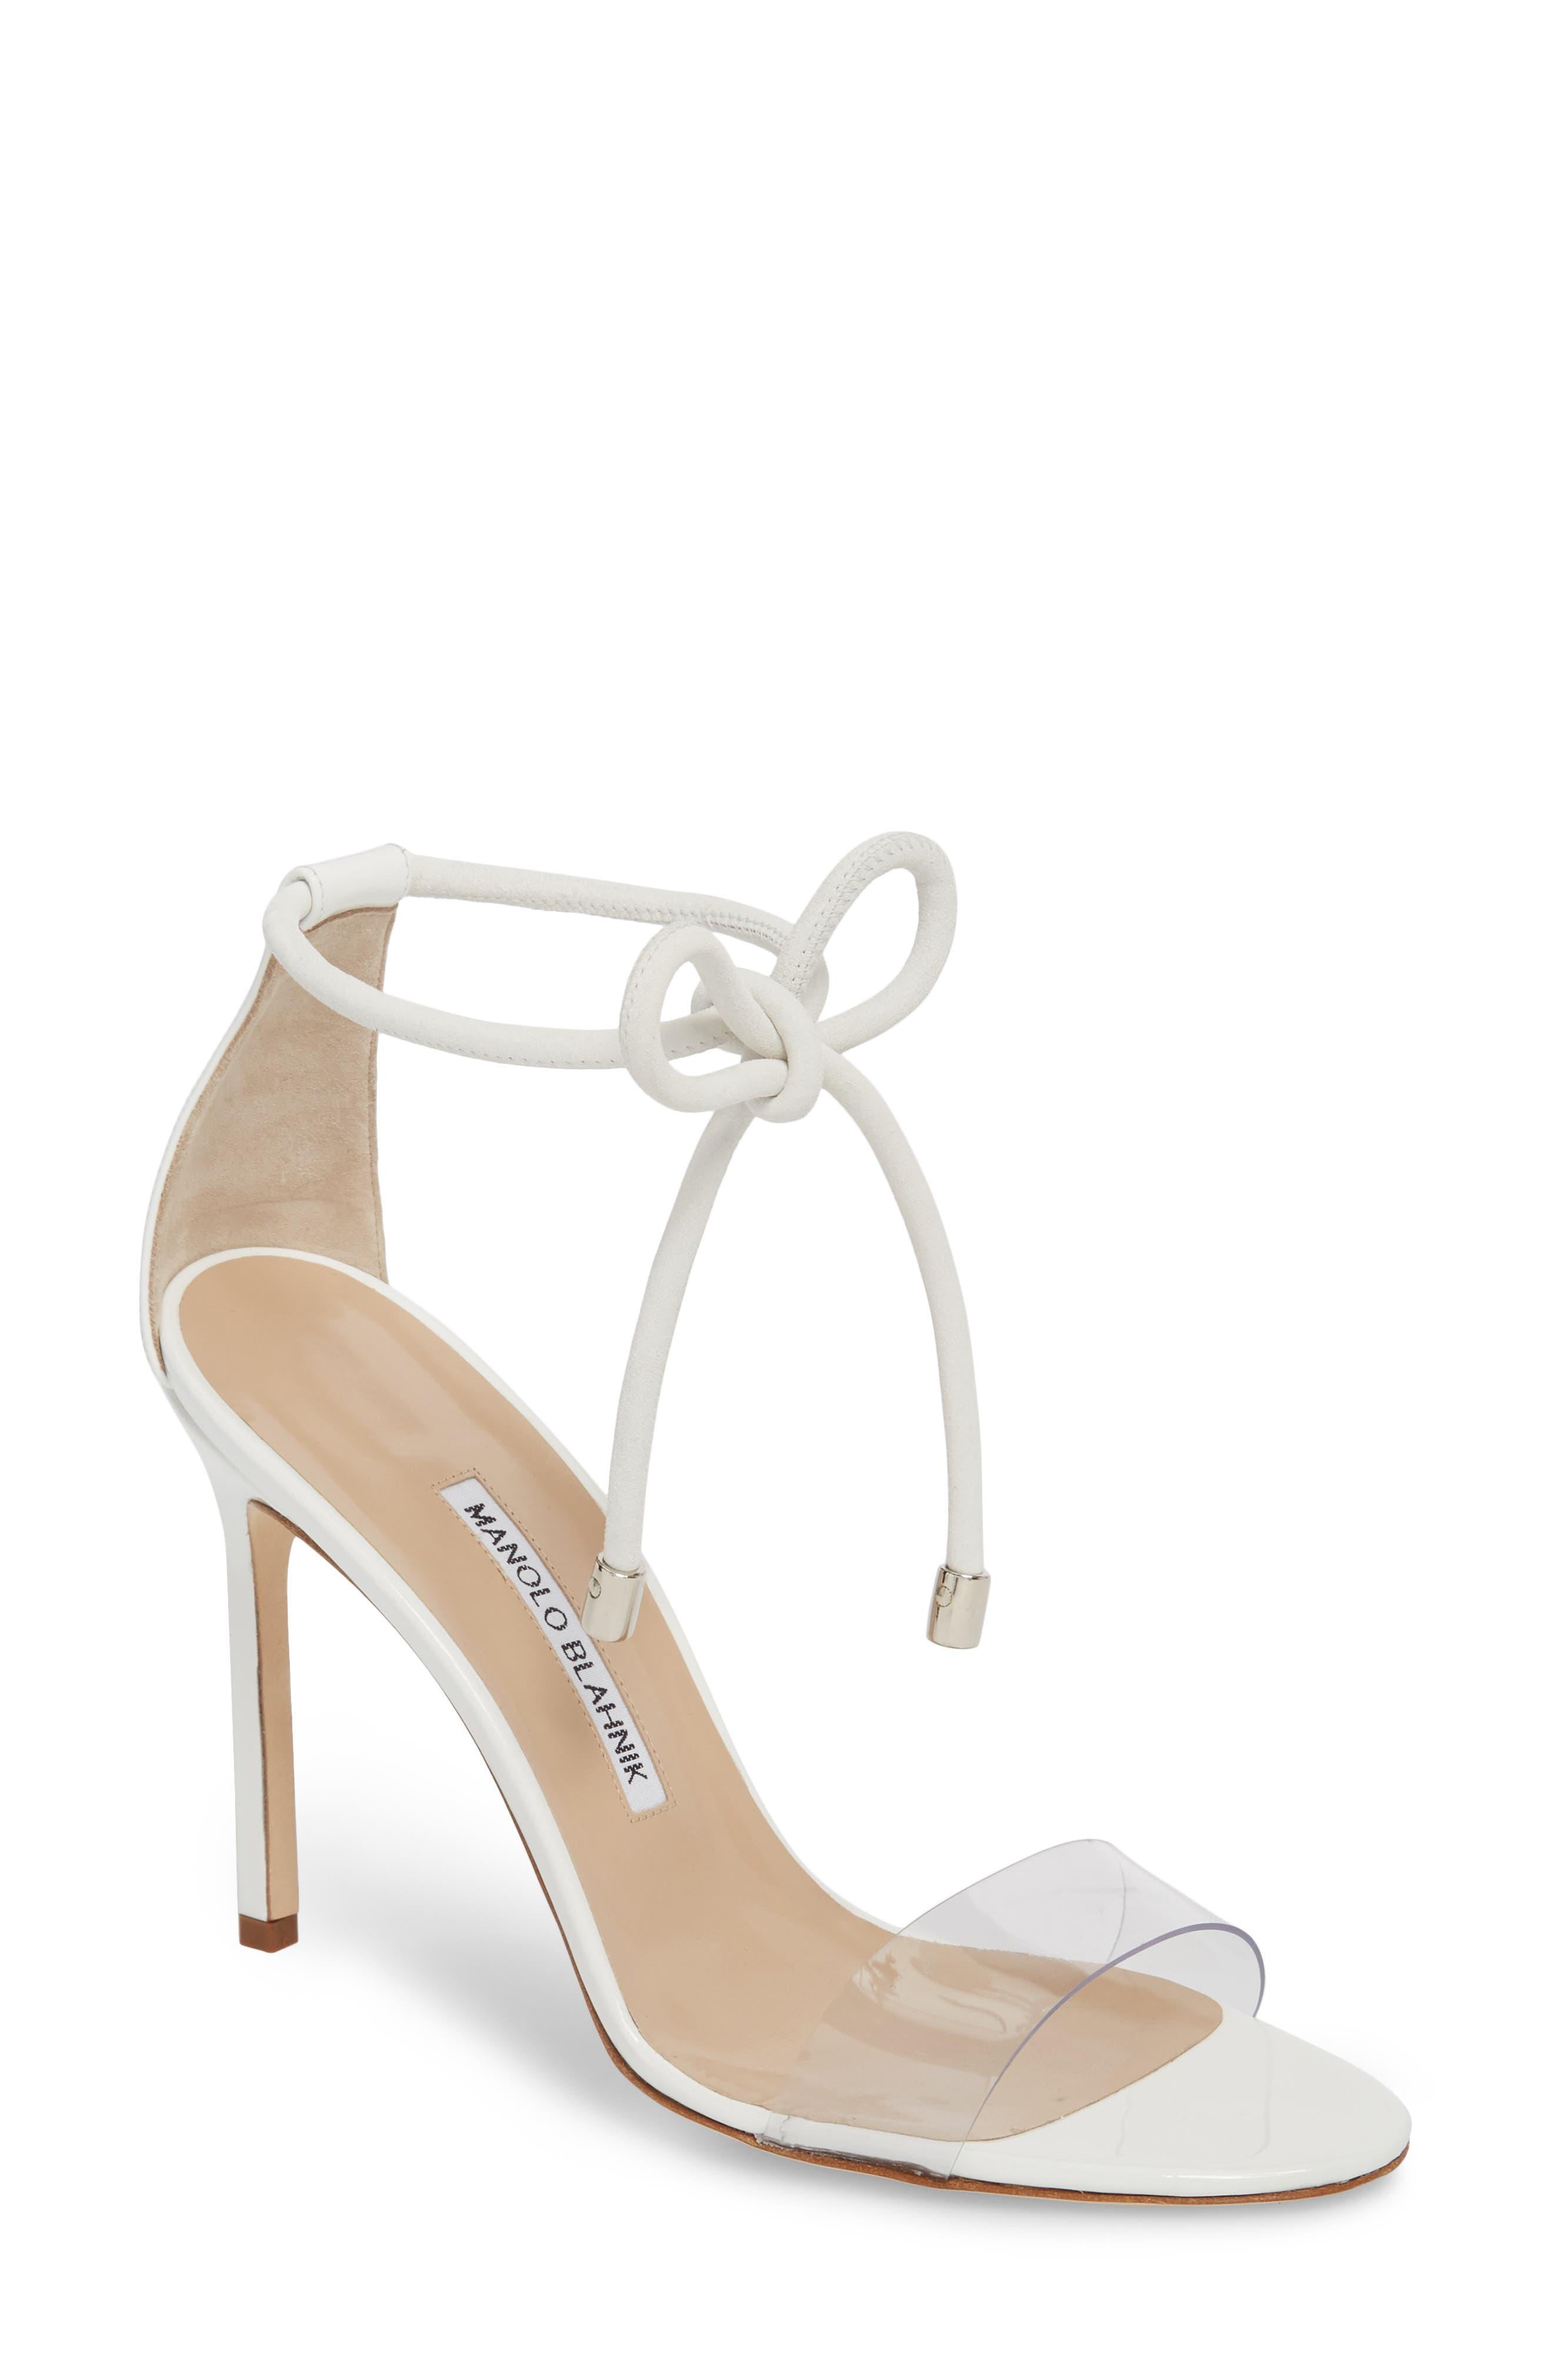 Alternate Image 1 Selected - Manolo Blahnik Estro Ankle Tie Sandal (Women)